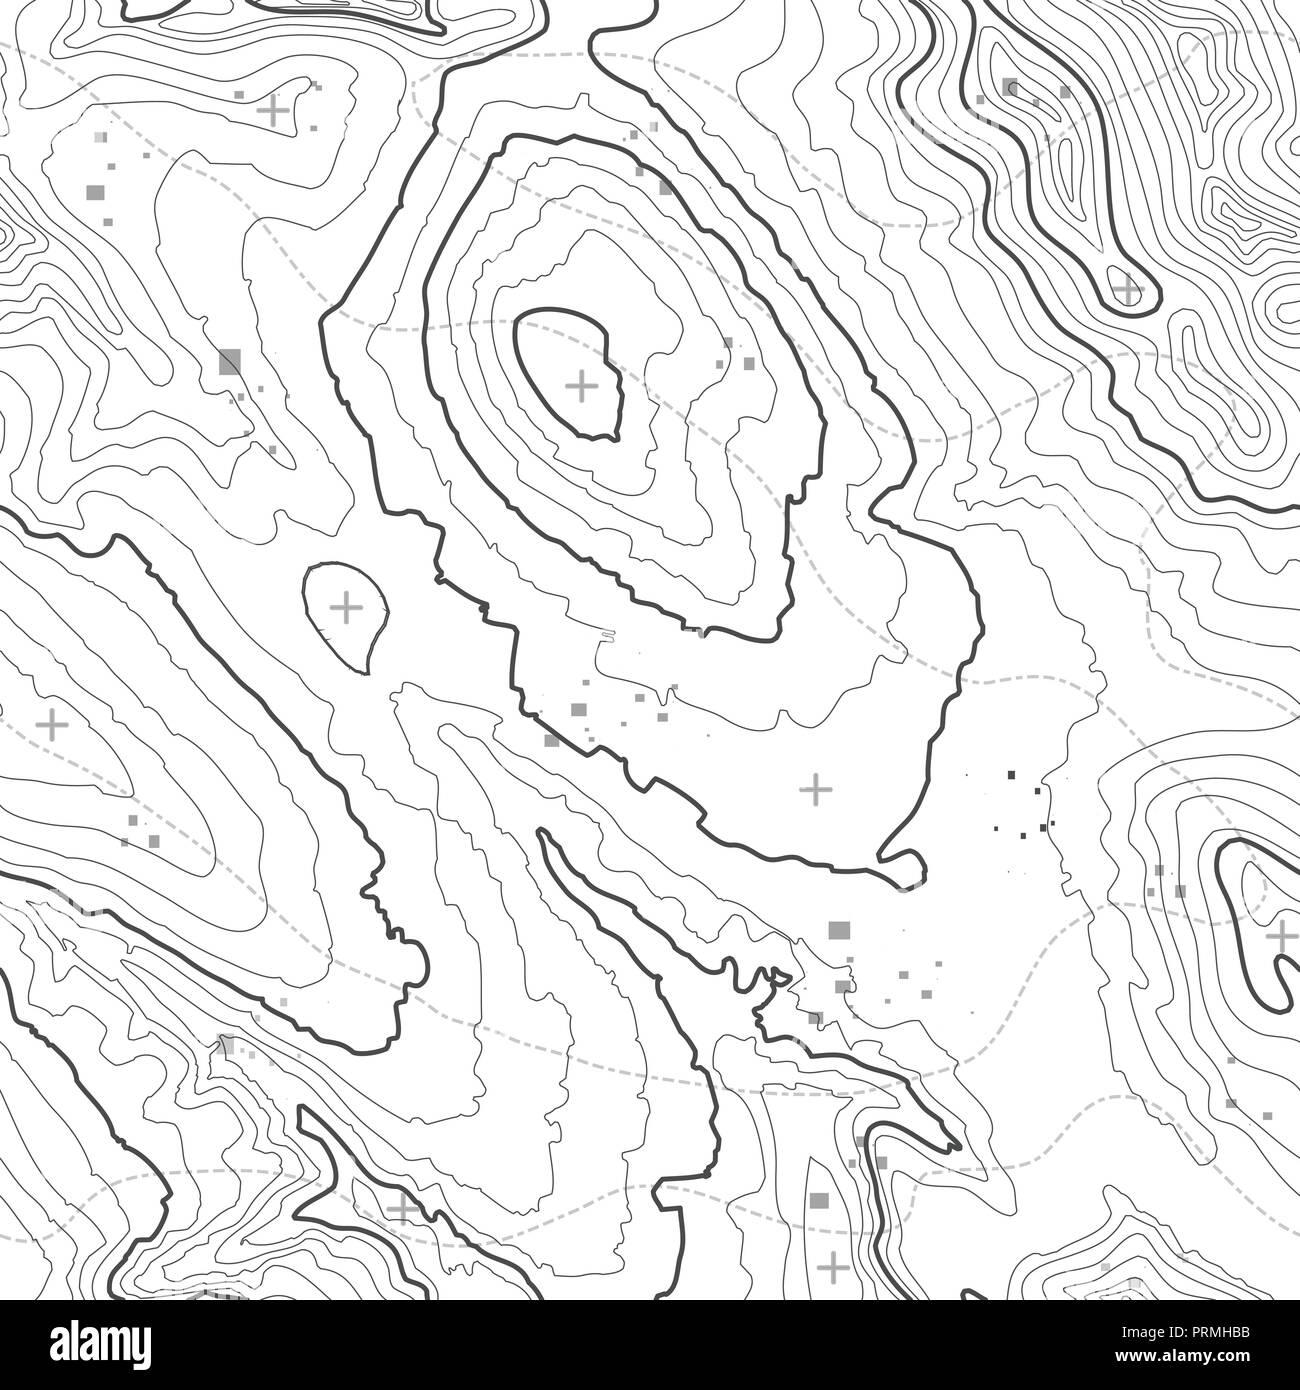 29 Contour Lines Topographic Map